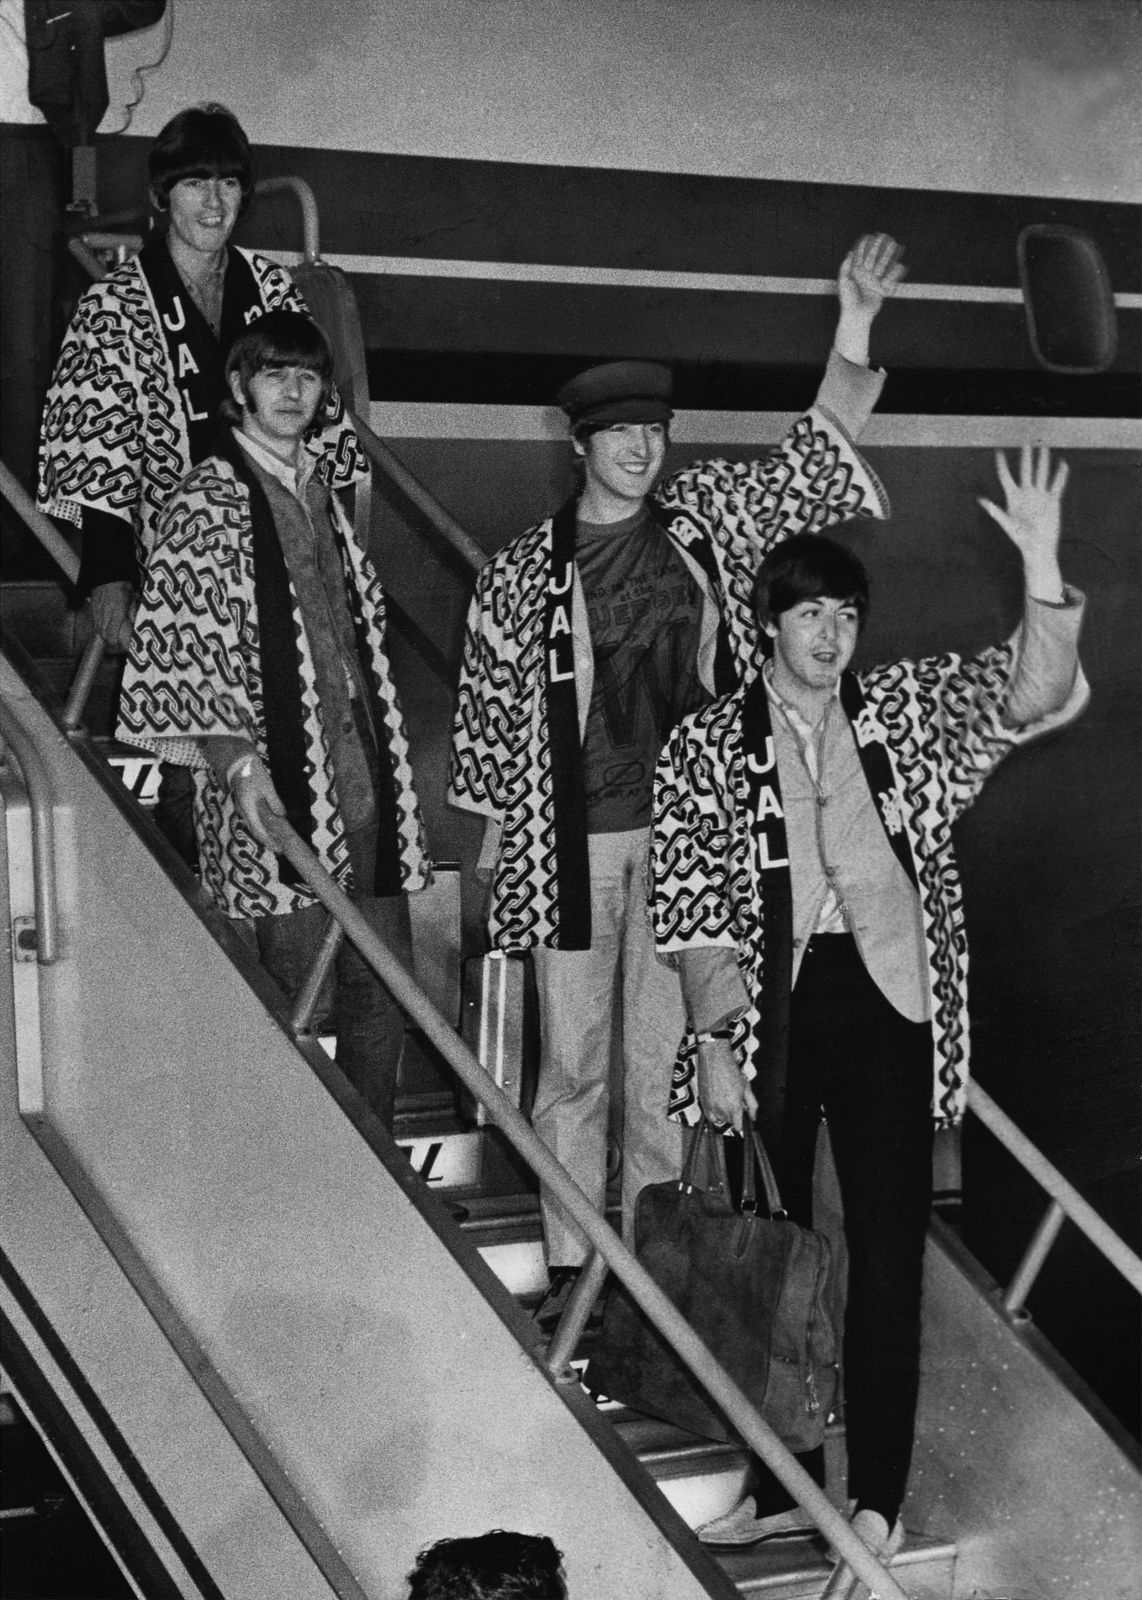 Paul McCartney's Latest Japan Performance A Night of Rarefied Magic